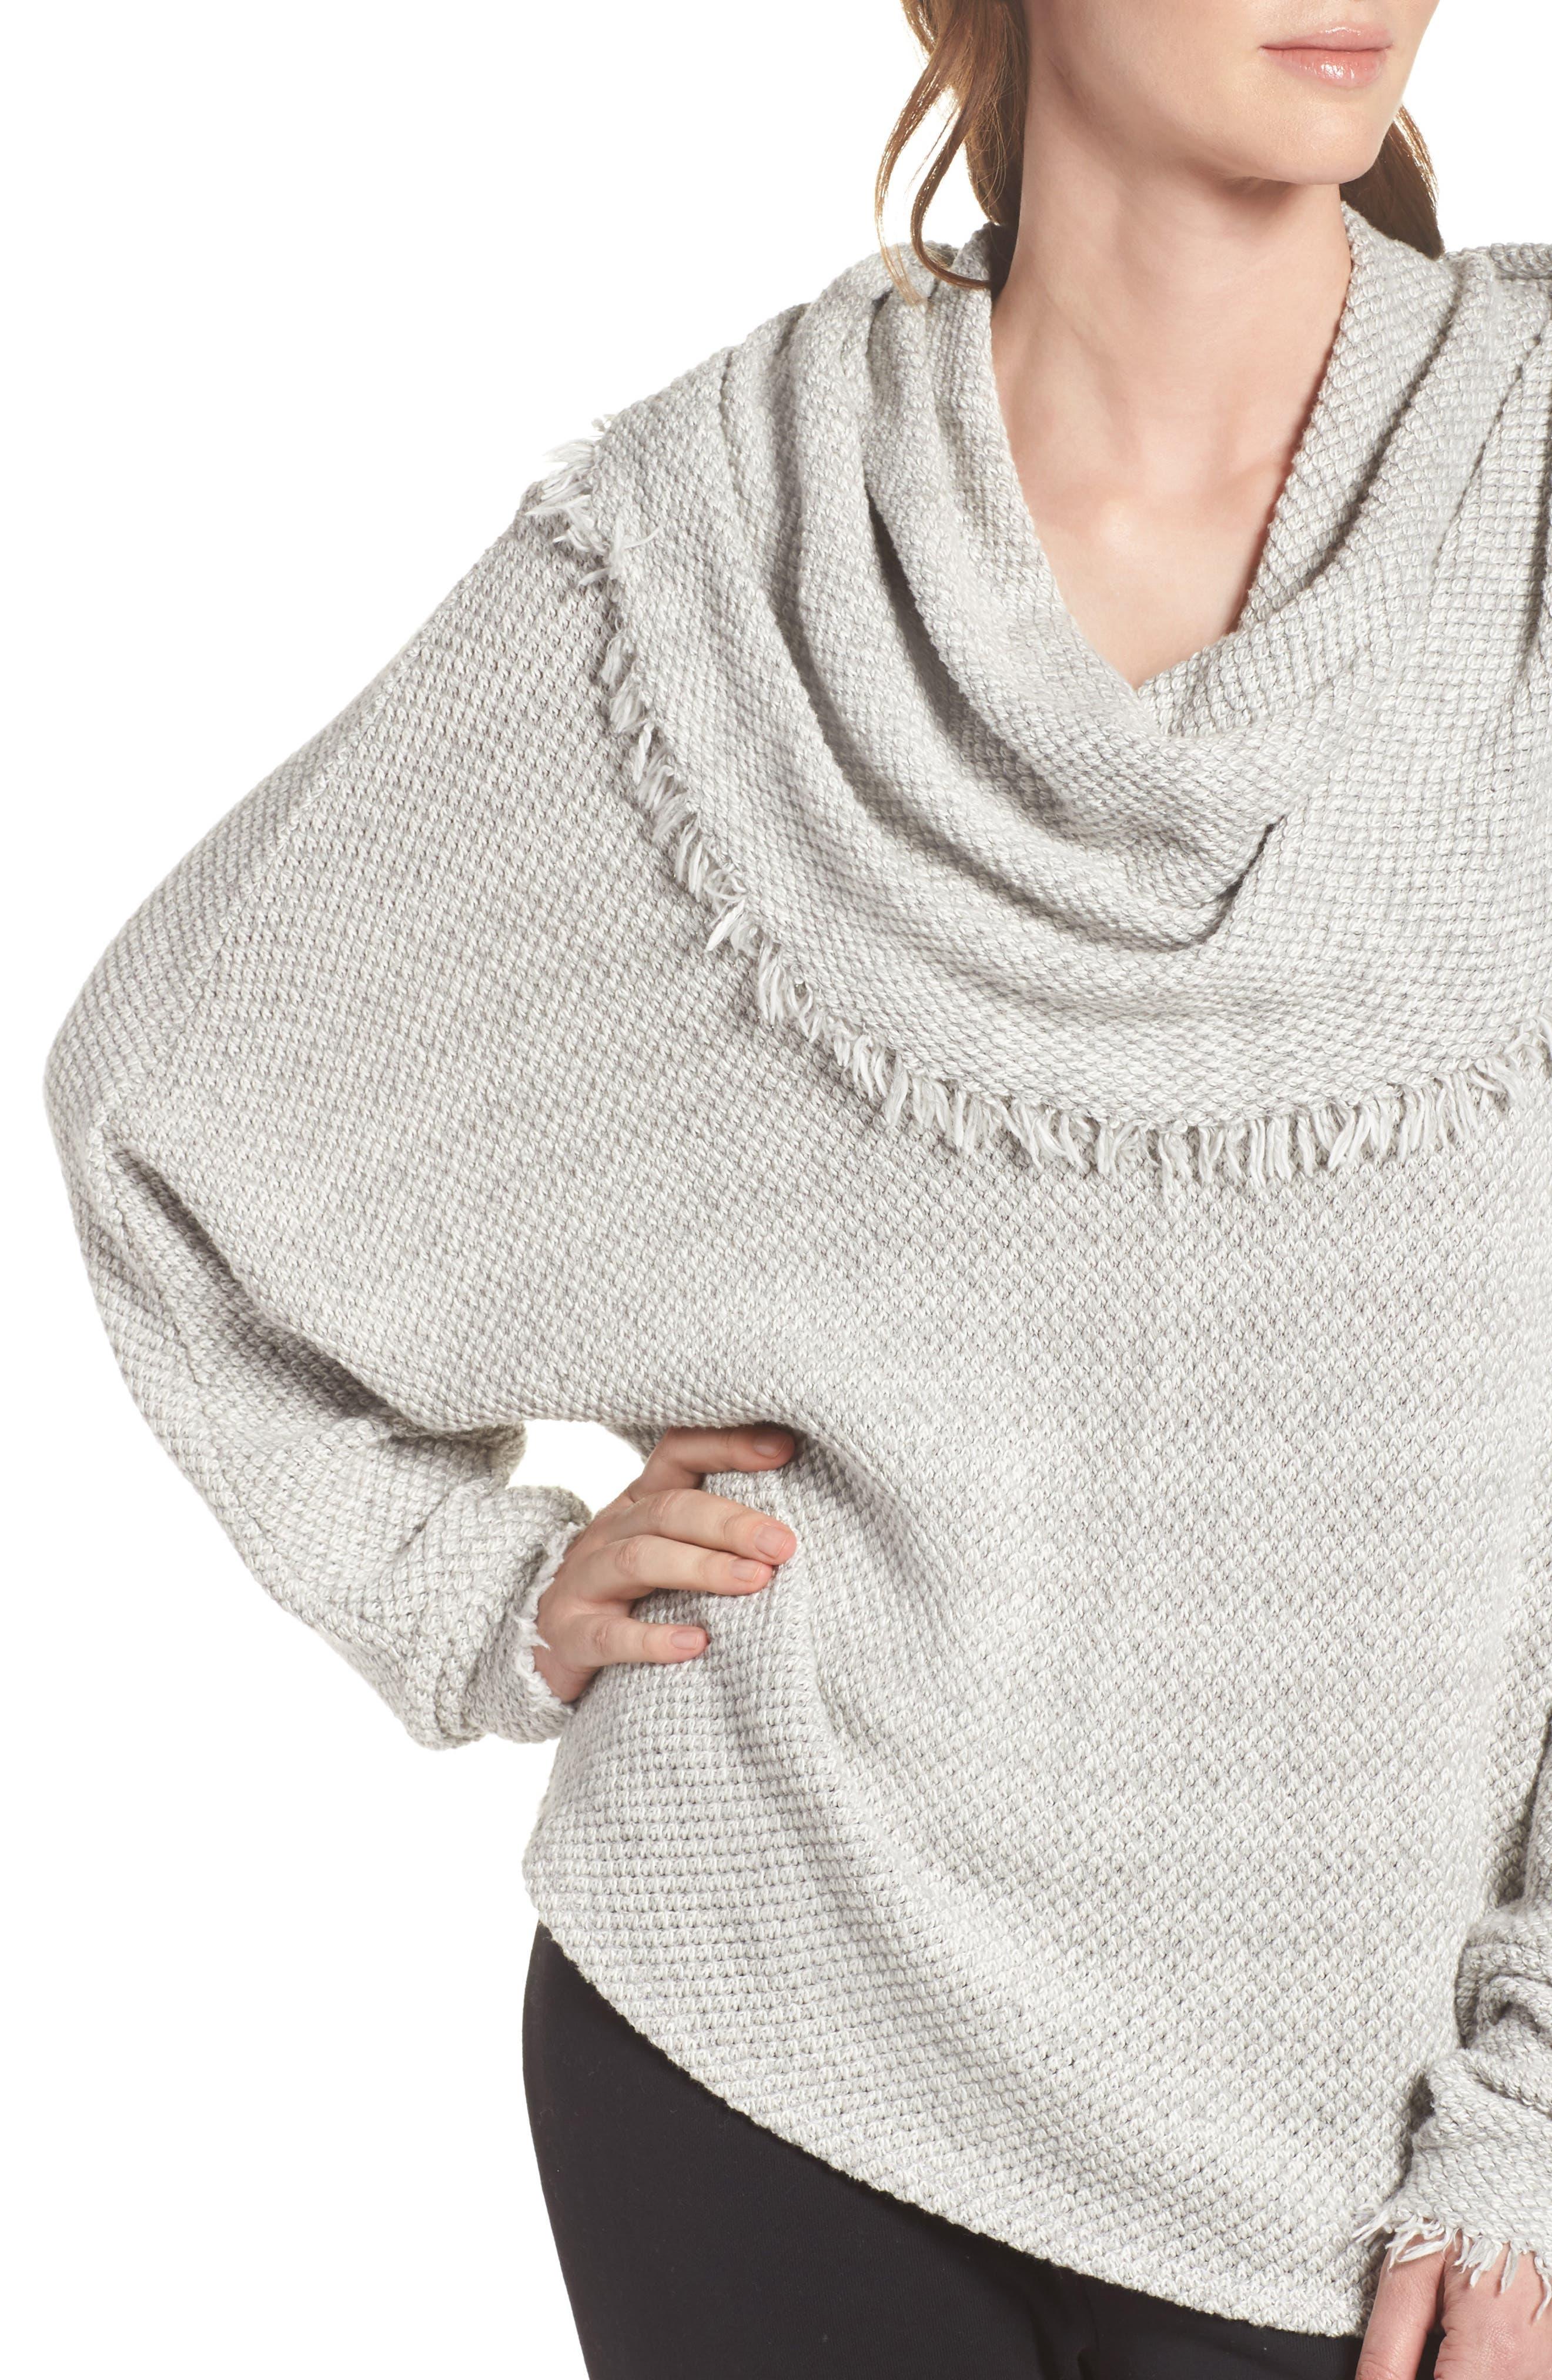 Oversize Turtleneck Sweater,                             Alternate thumbnail 4, color,                             Heather Grey